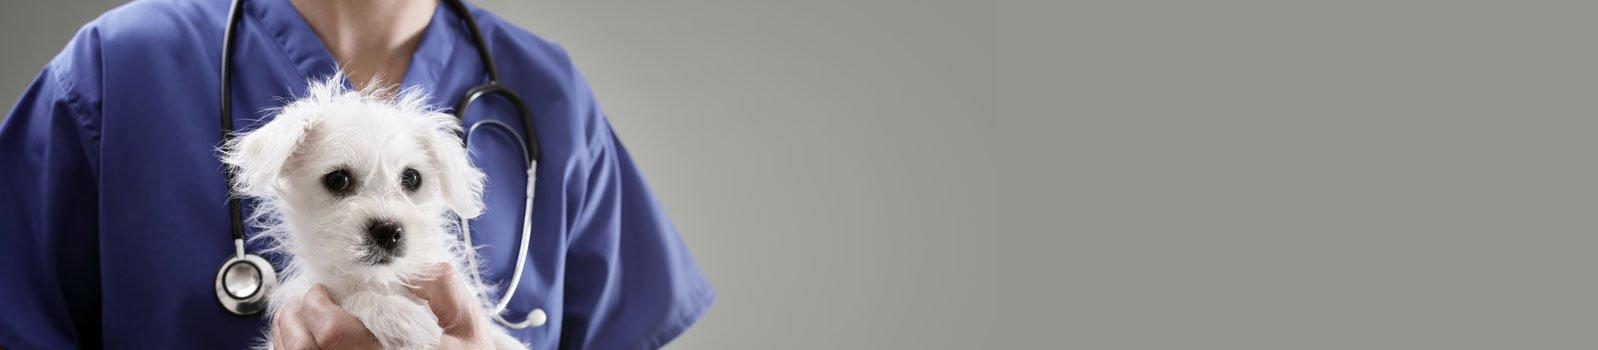 Medicina Veterinária - UniBrasil - Banner